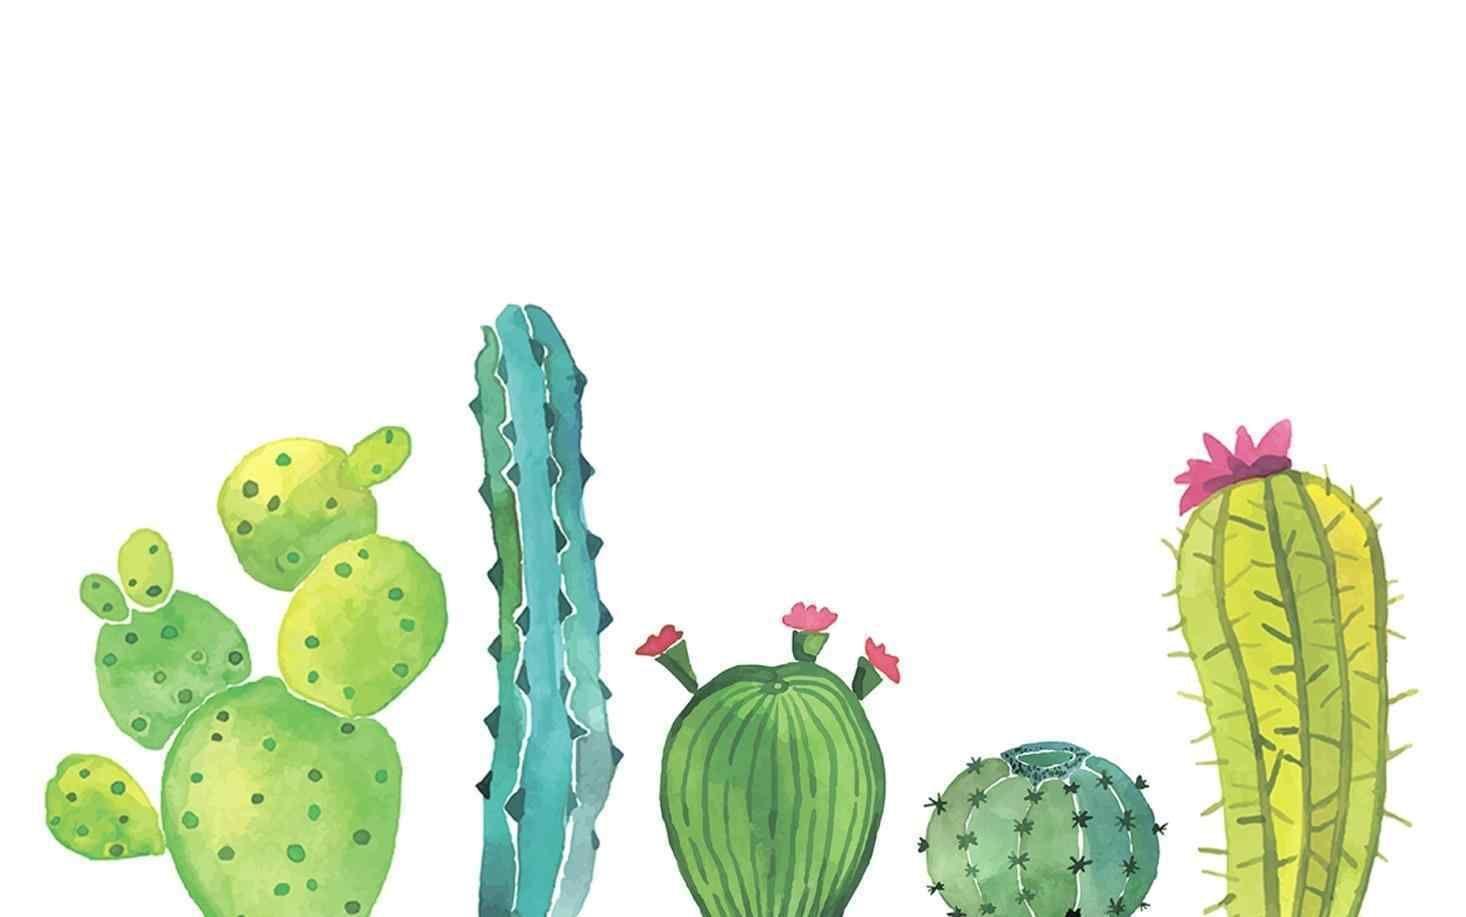 Cute Cactus Succulent Wallpaper Desktop Wallpaper Summer Wallpaper Notebook Cute Desktop Wallpaper